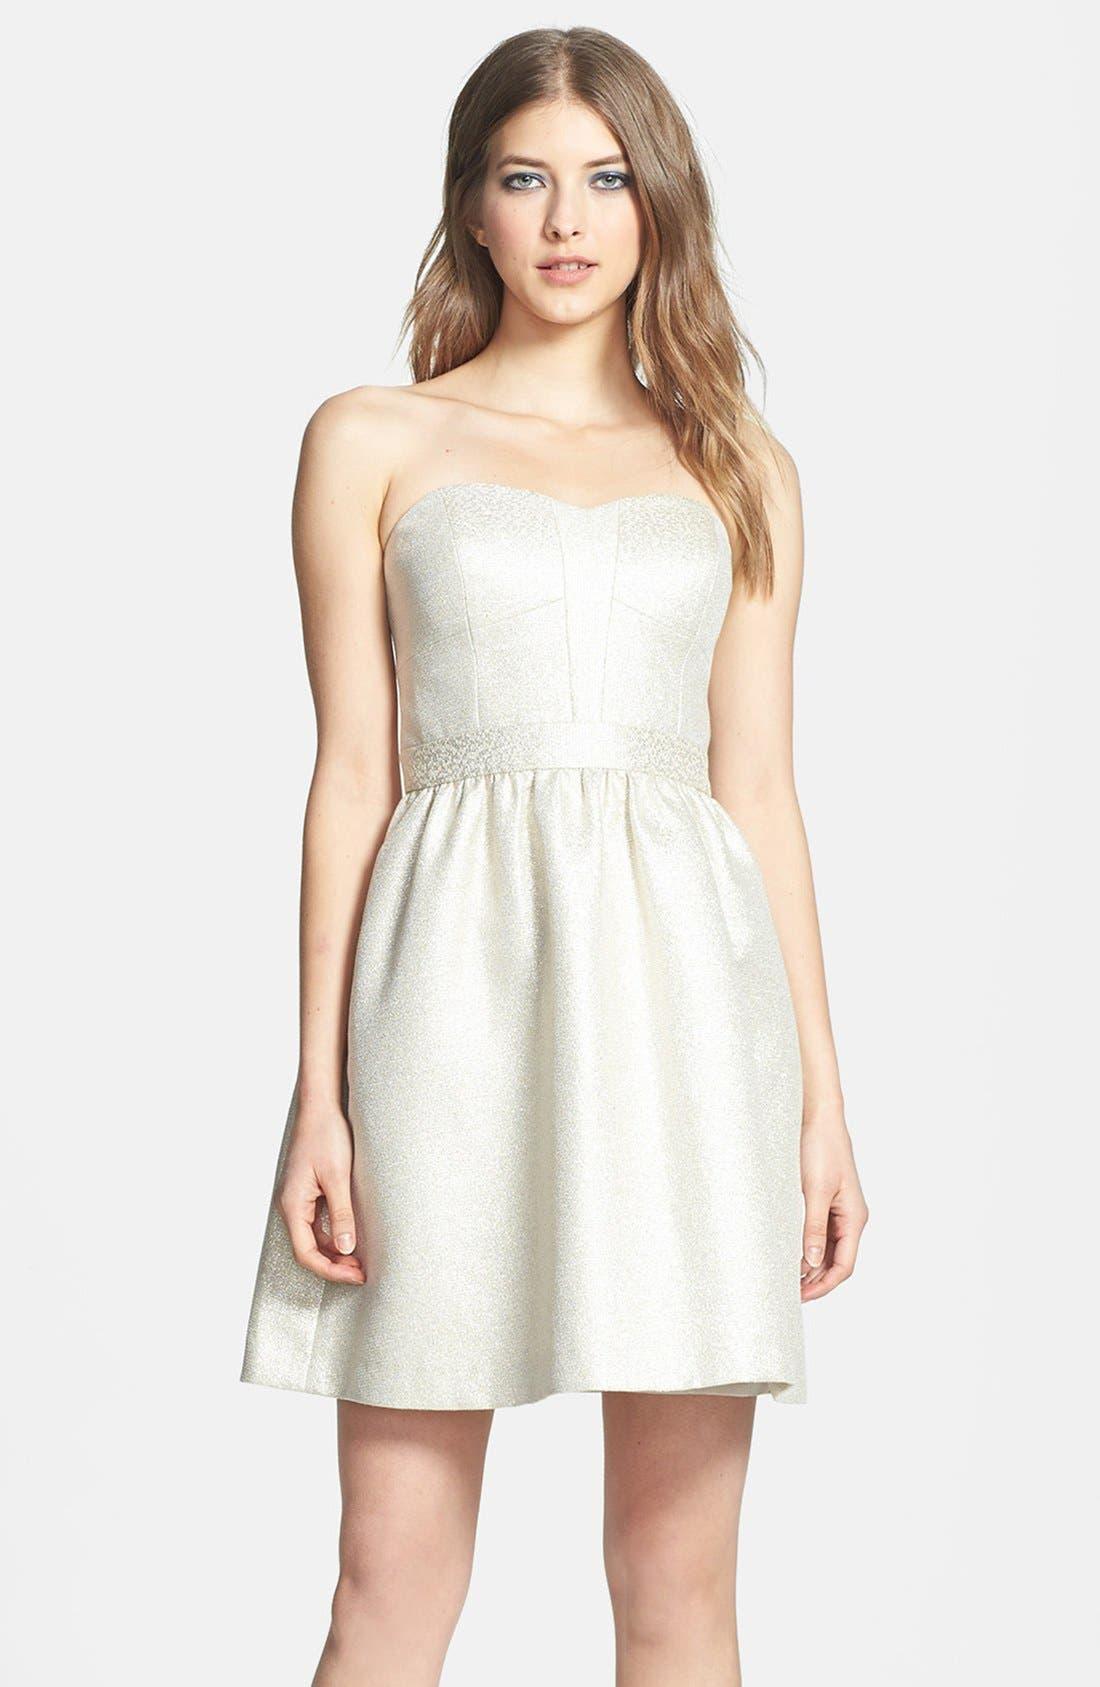 Alternate Image 1 Selected - Aidan by Aidan Mattox Strapless Shimmer Jacquard Dress